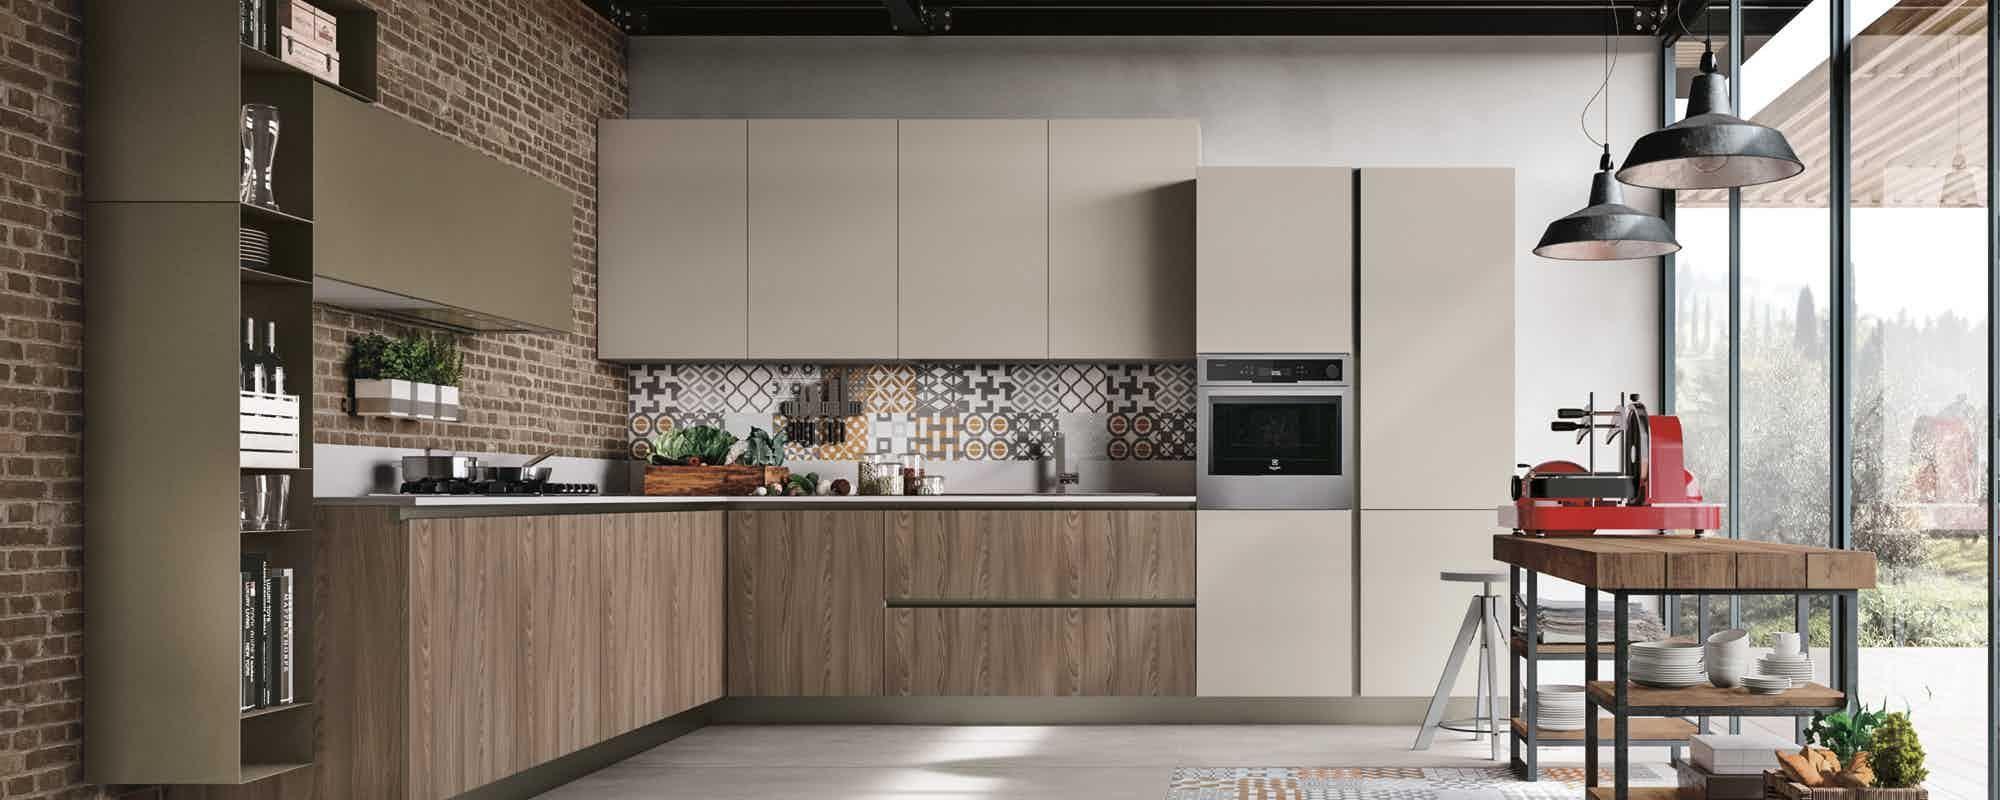 cucine moderne stosa - modello cucina infinity 13 | Kitchens ...